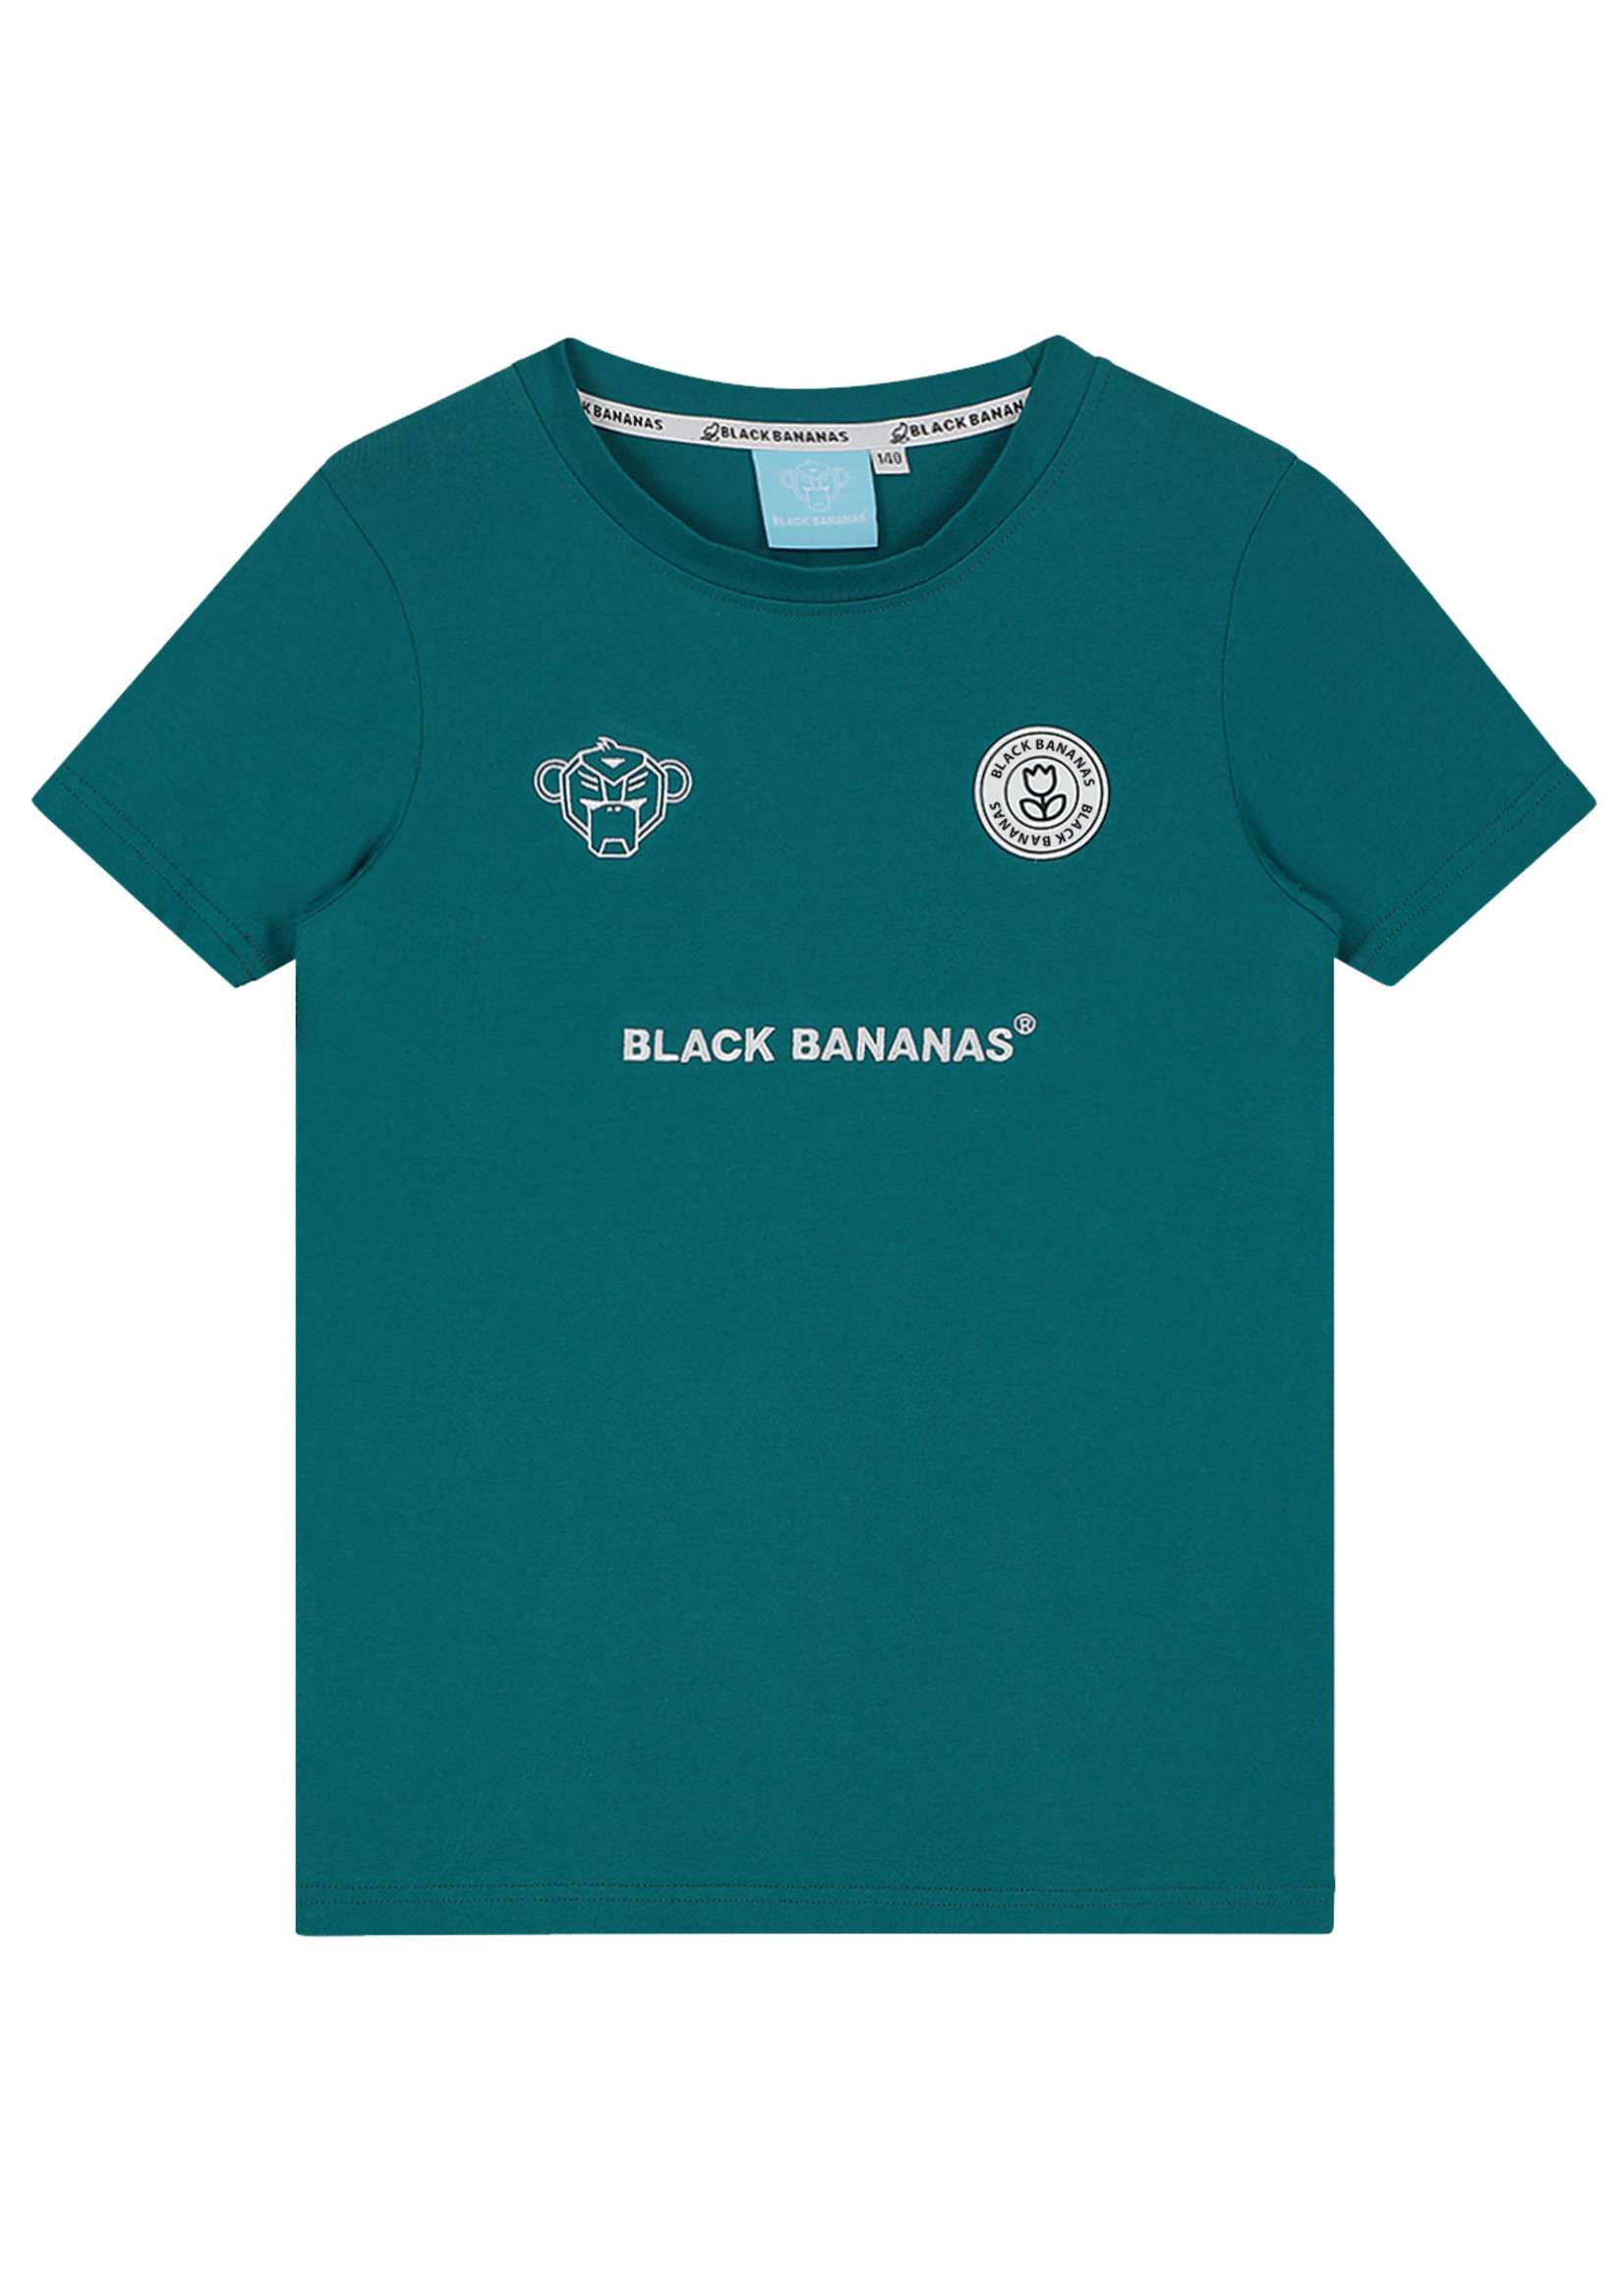 Black Bananas BlackBananas F.C. basic Tee aqua